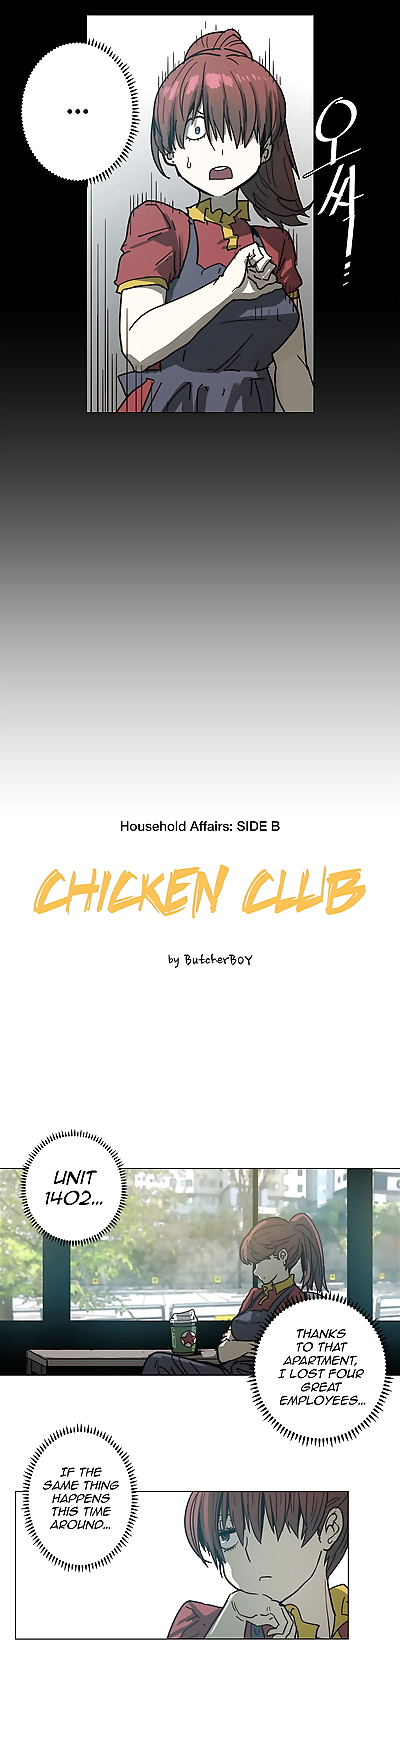 ButcherBoy Household Affair:SIDE B - Chicken ClubEnglish - part 3